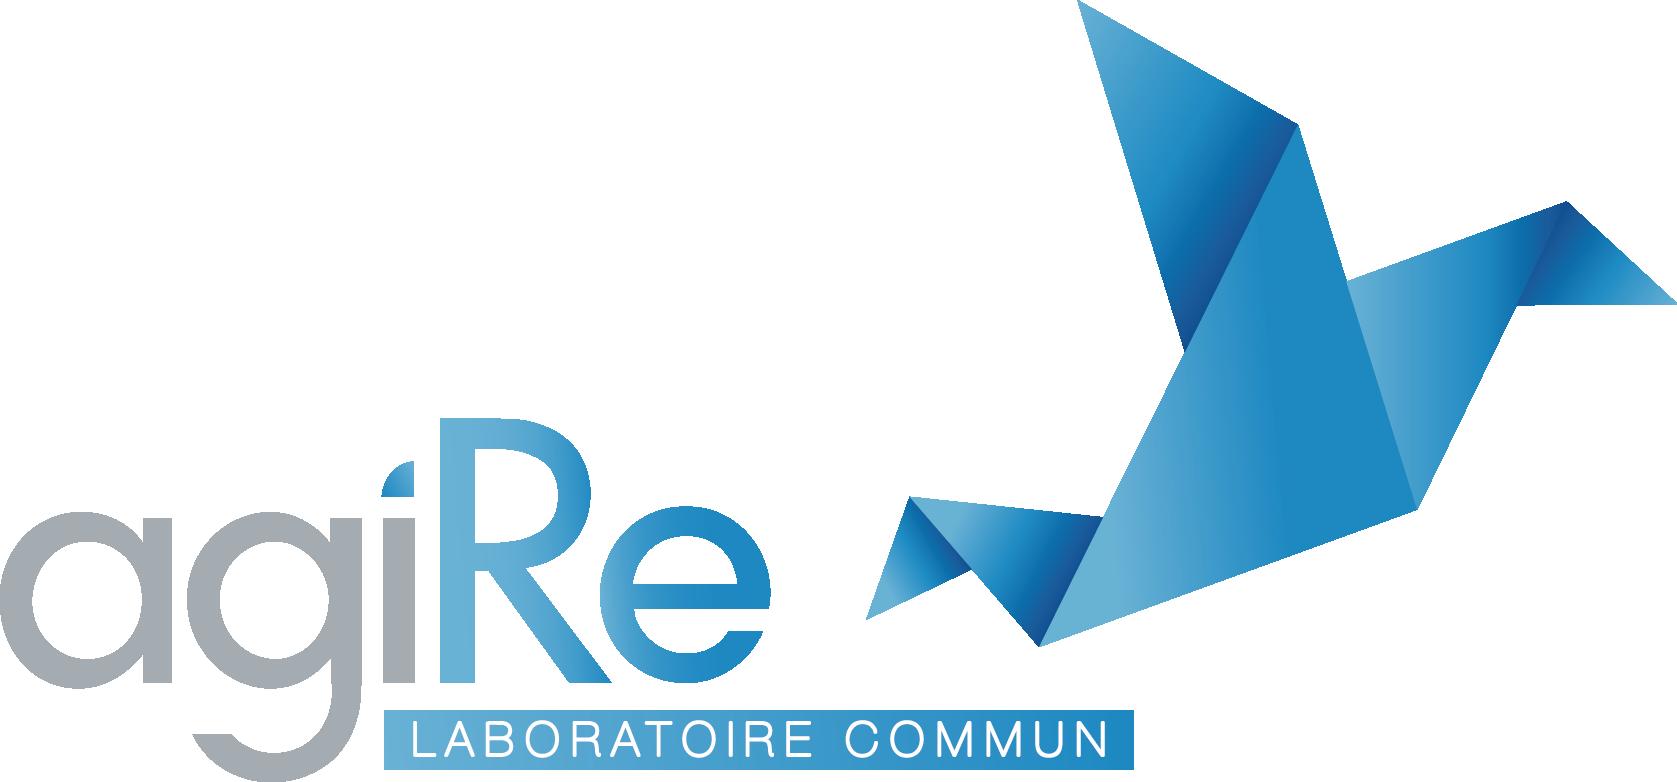 Laboratoire Commun de Recherche AGIRE